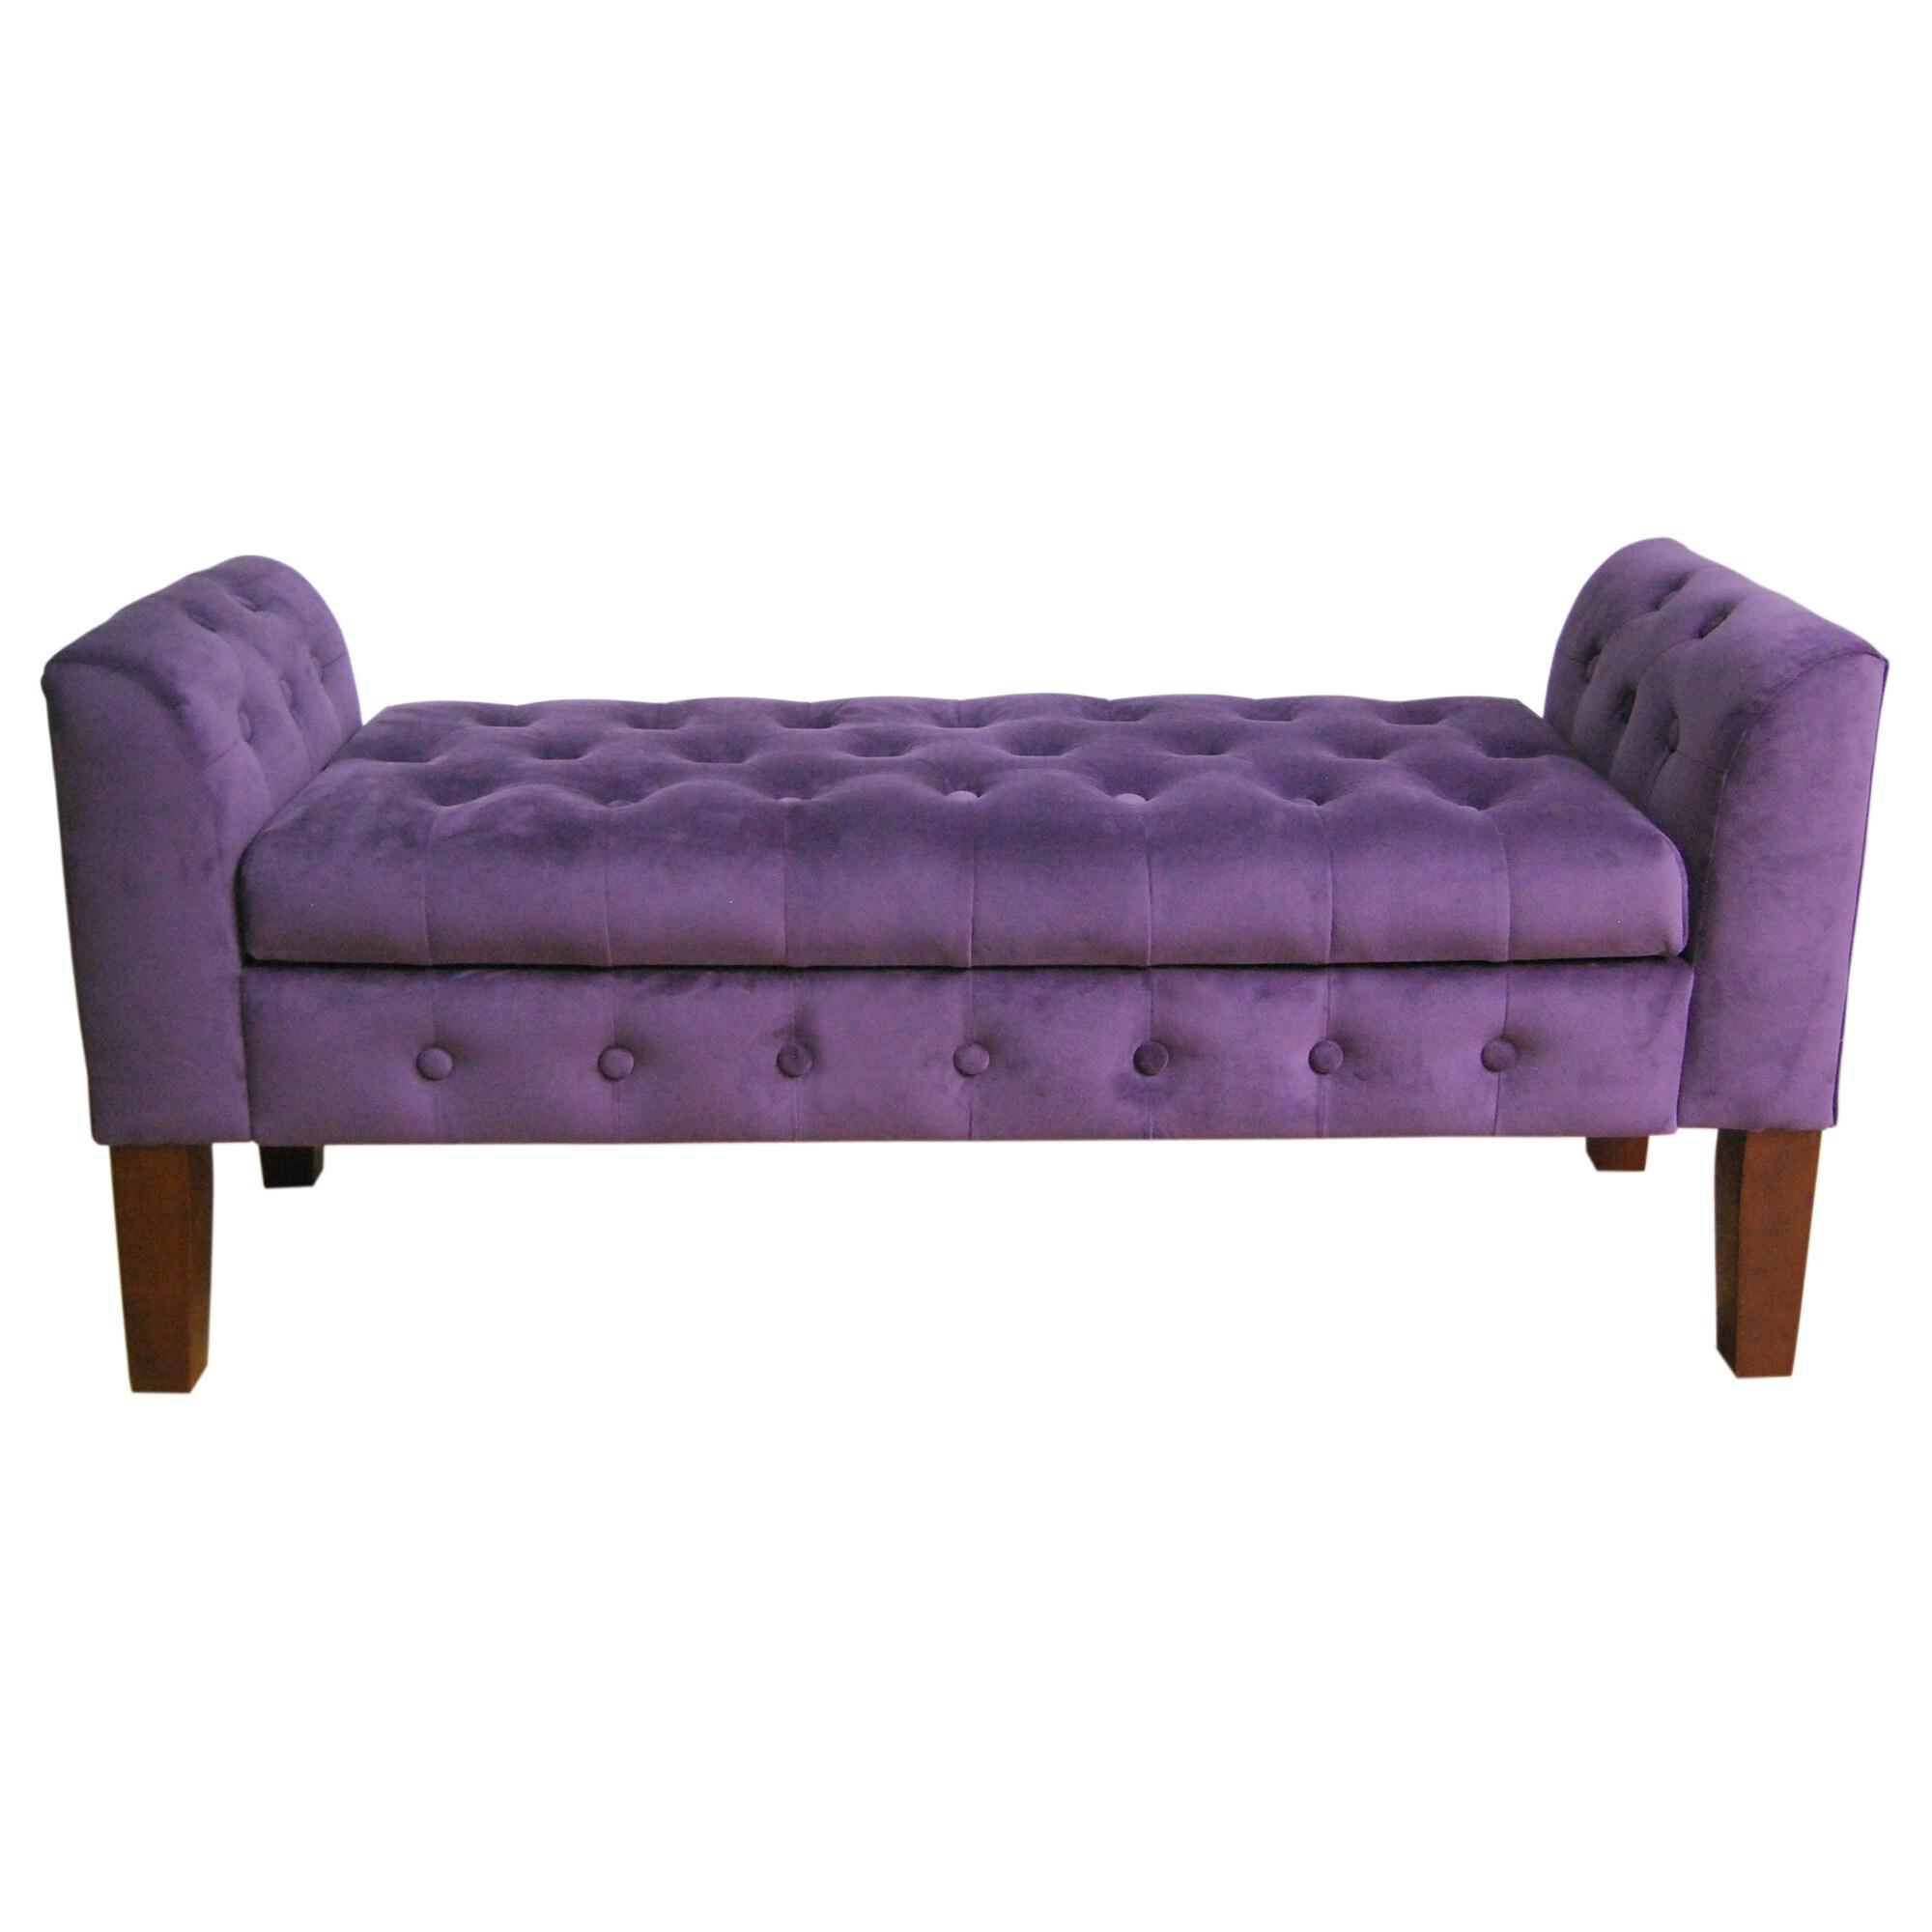 glamorous accent contemporary calix pale velvet bench purple customize blush modern pink light gold